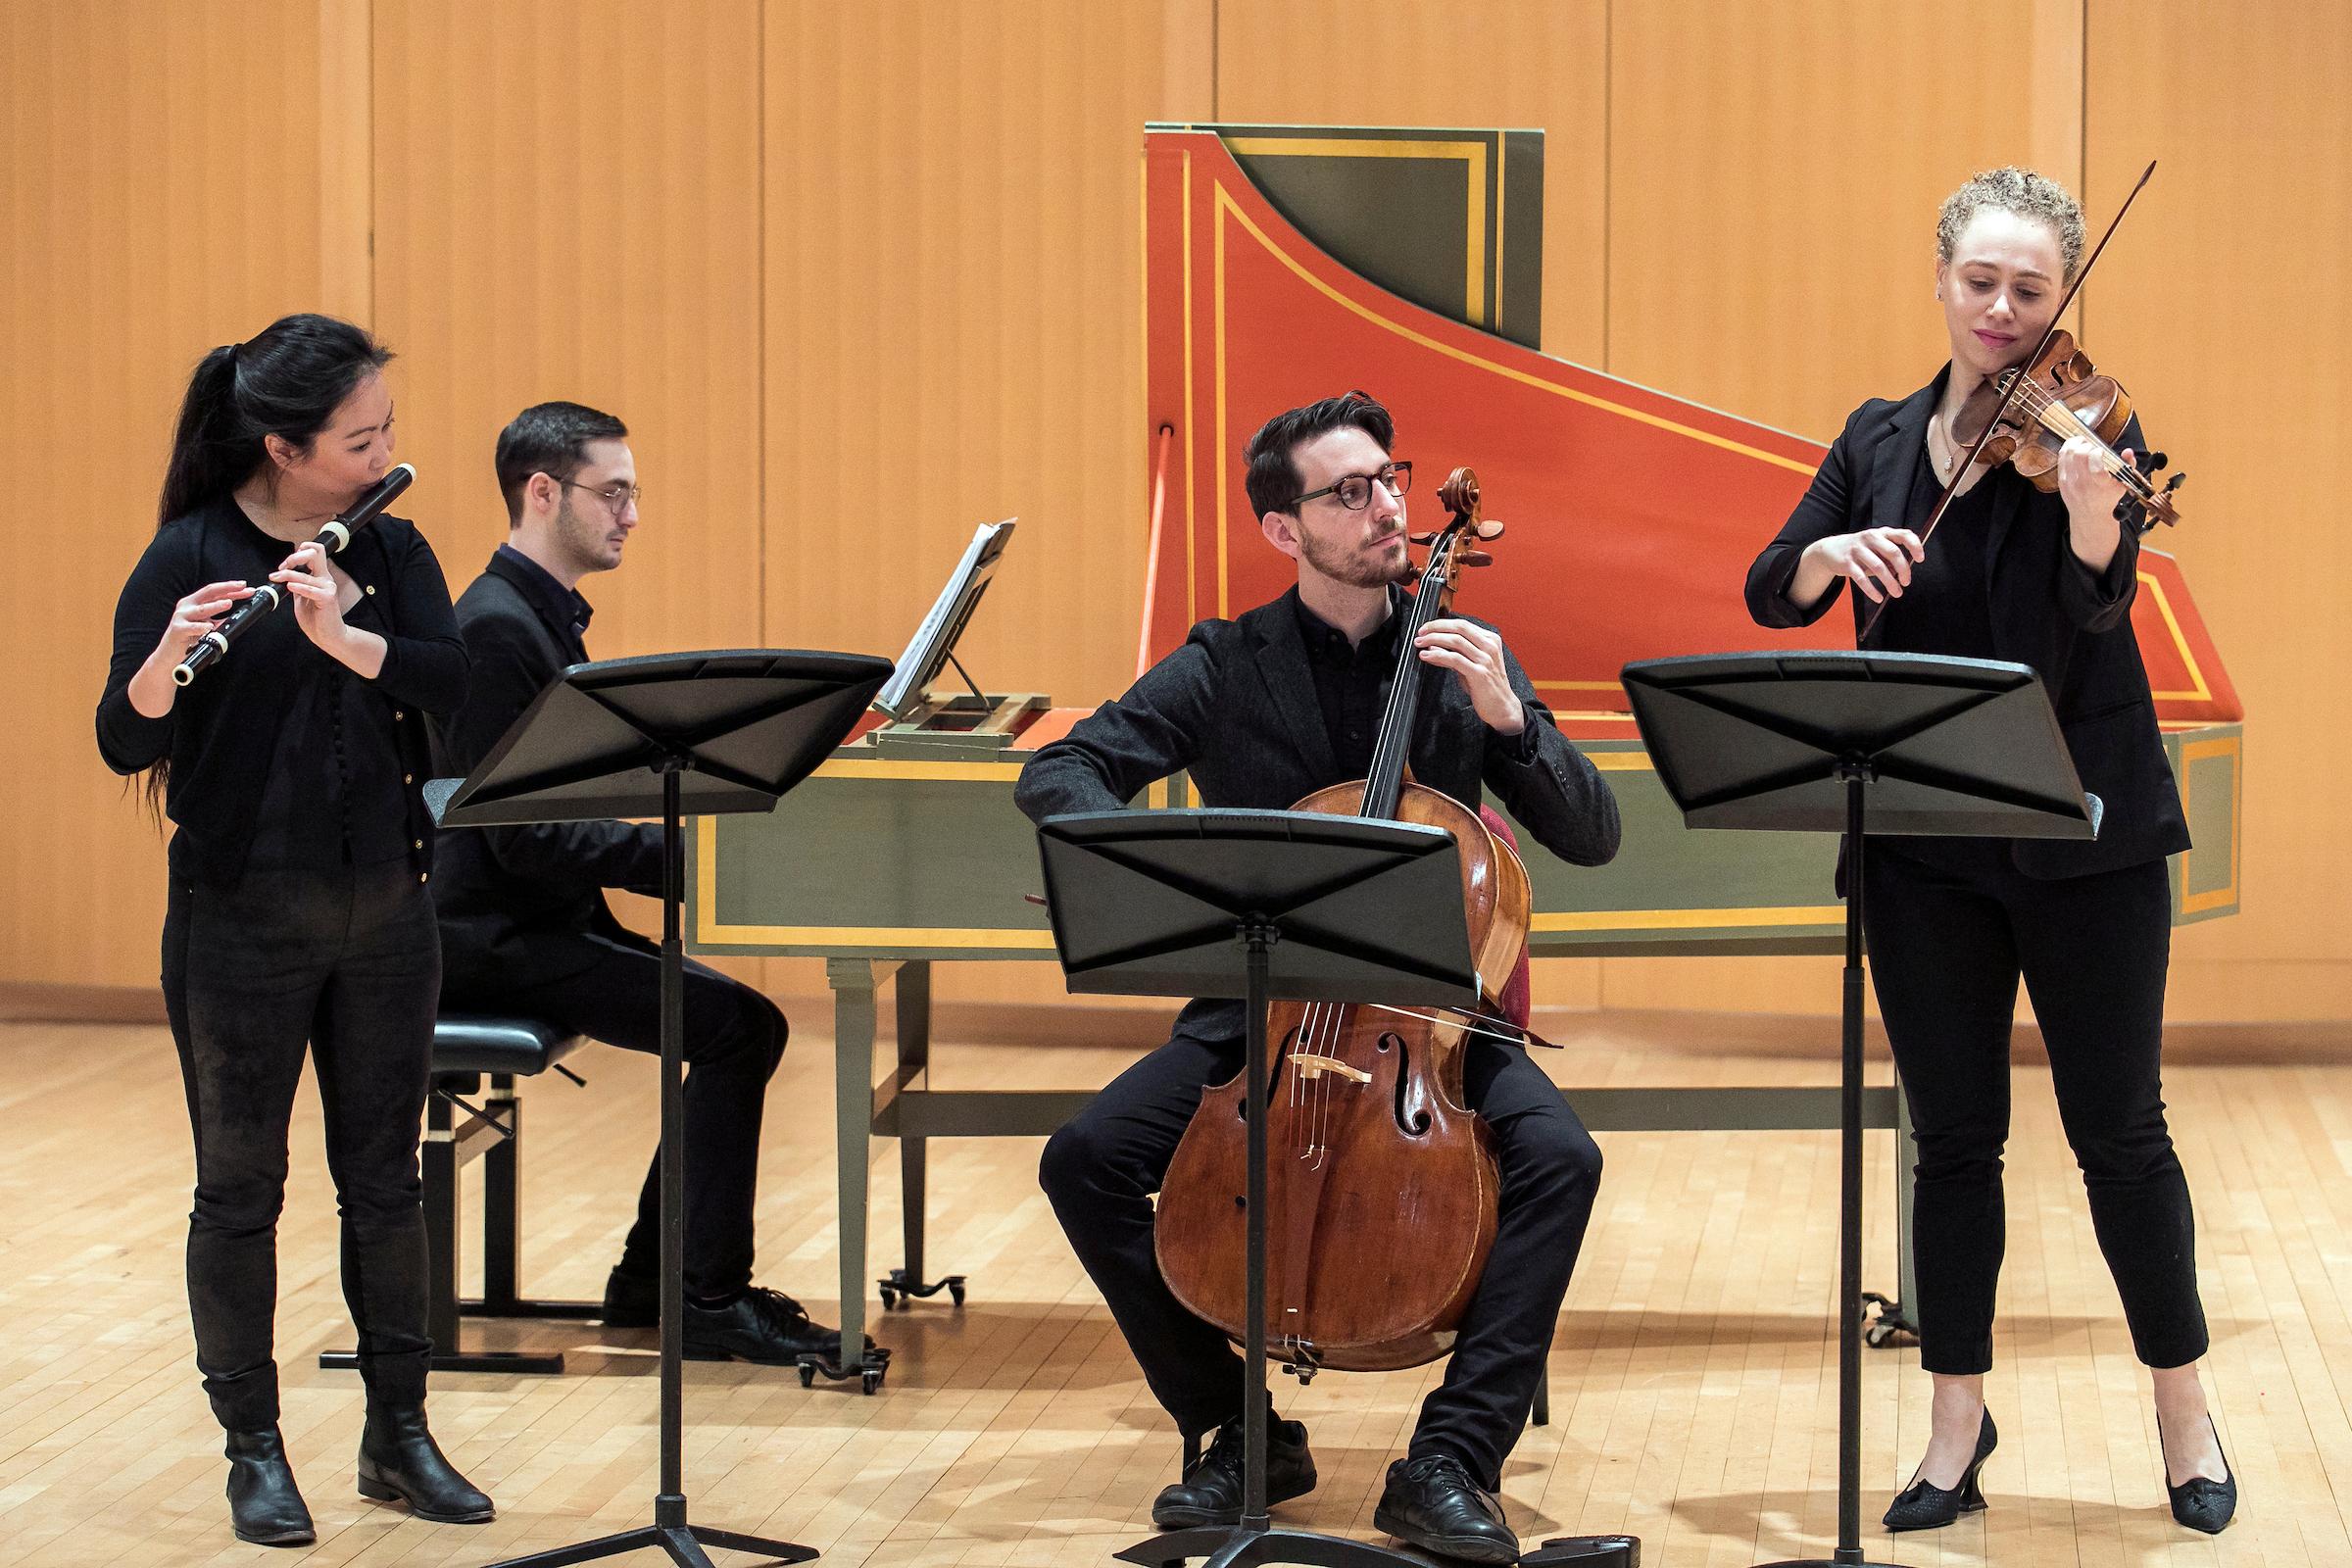 WQXR's Midday Masterpieces: Juilliard's Historical Performance Program